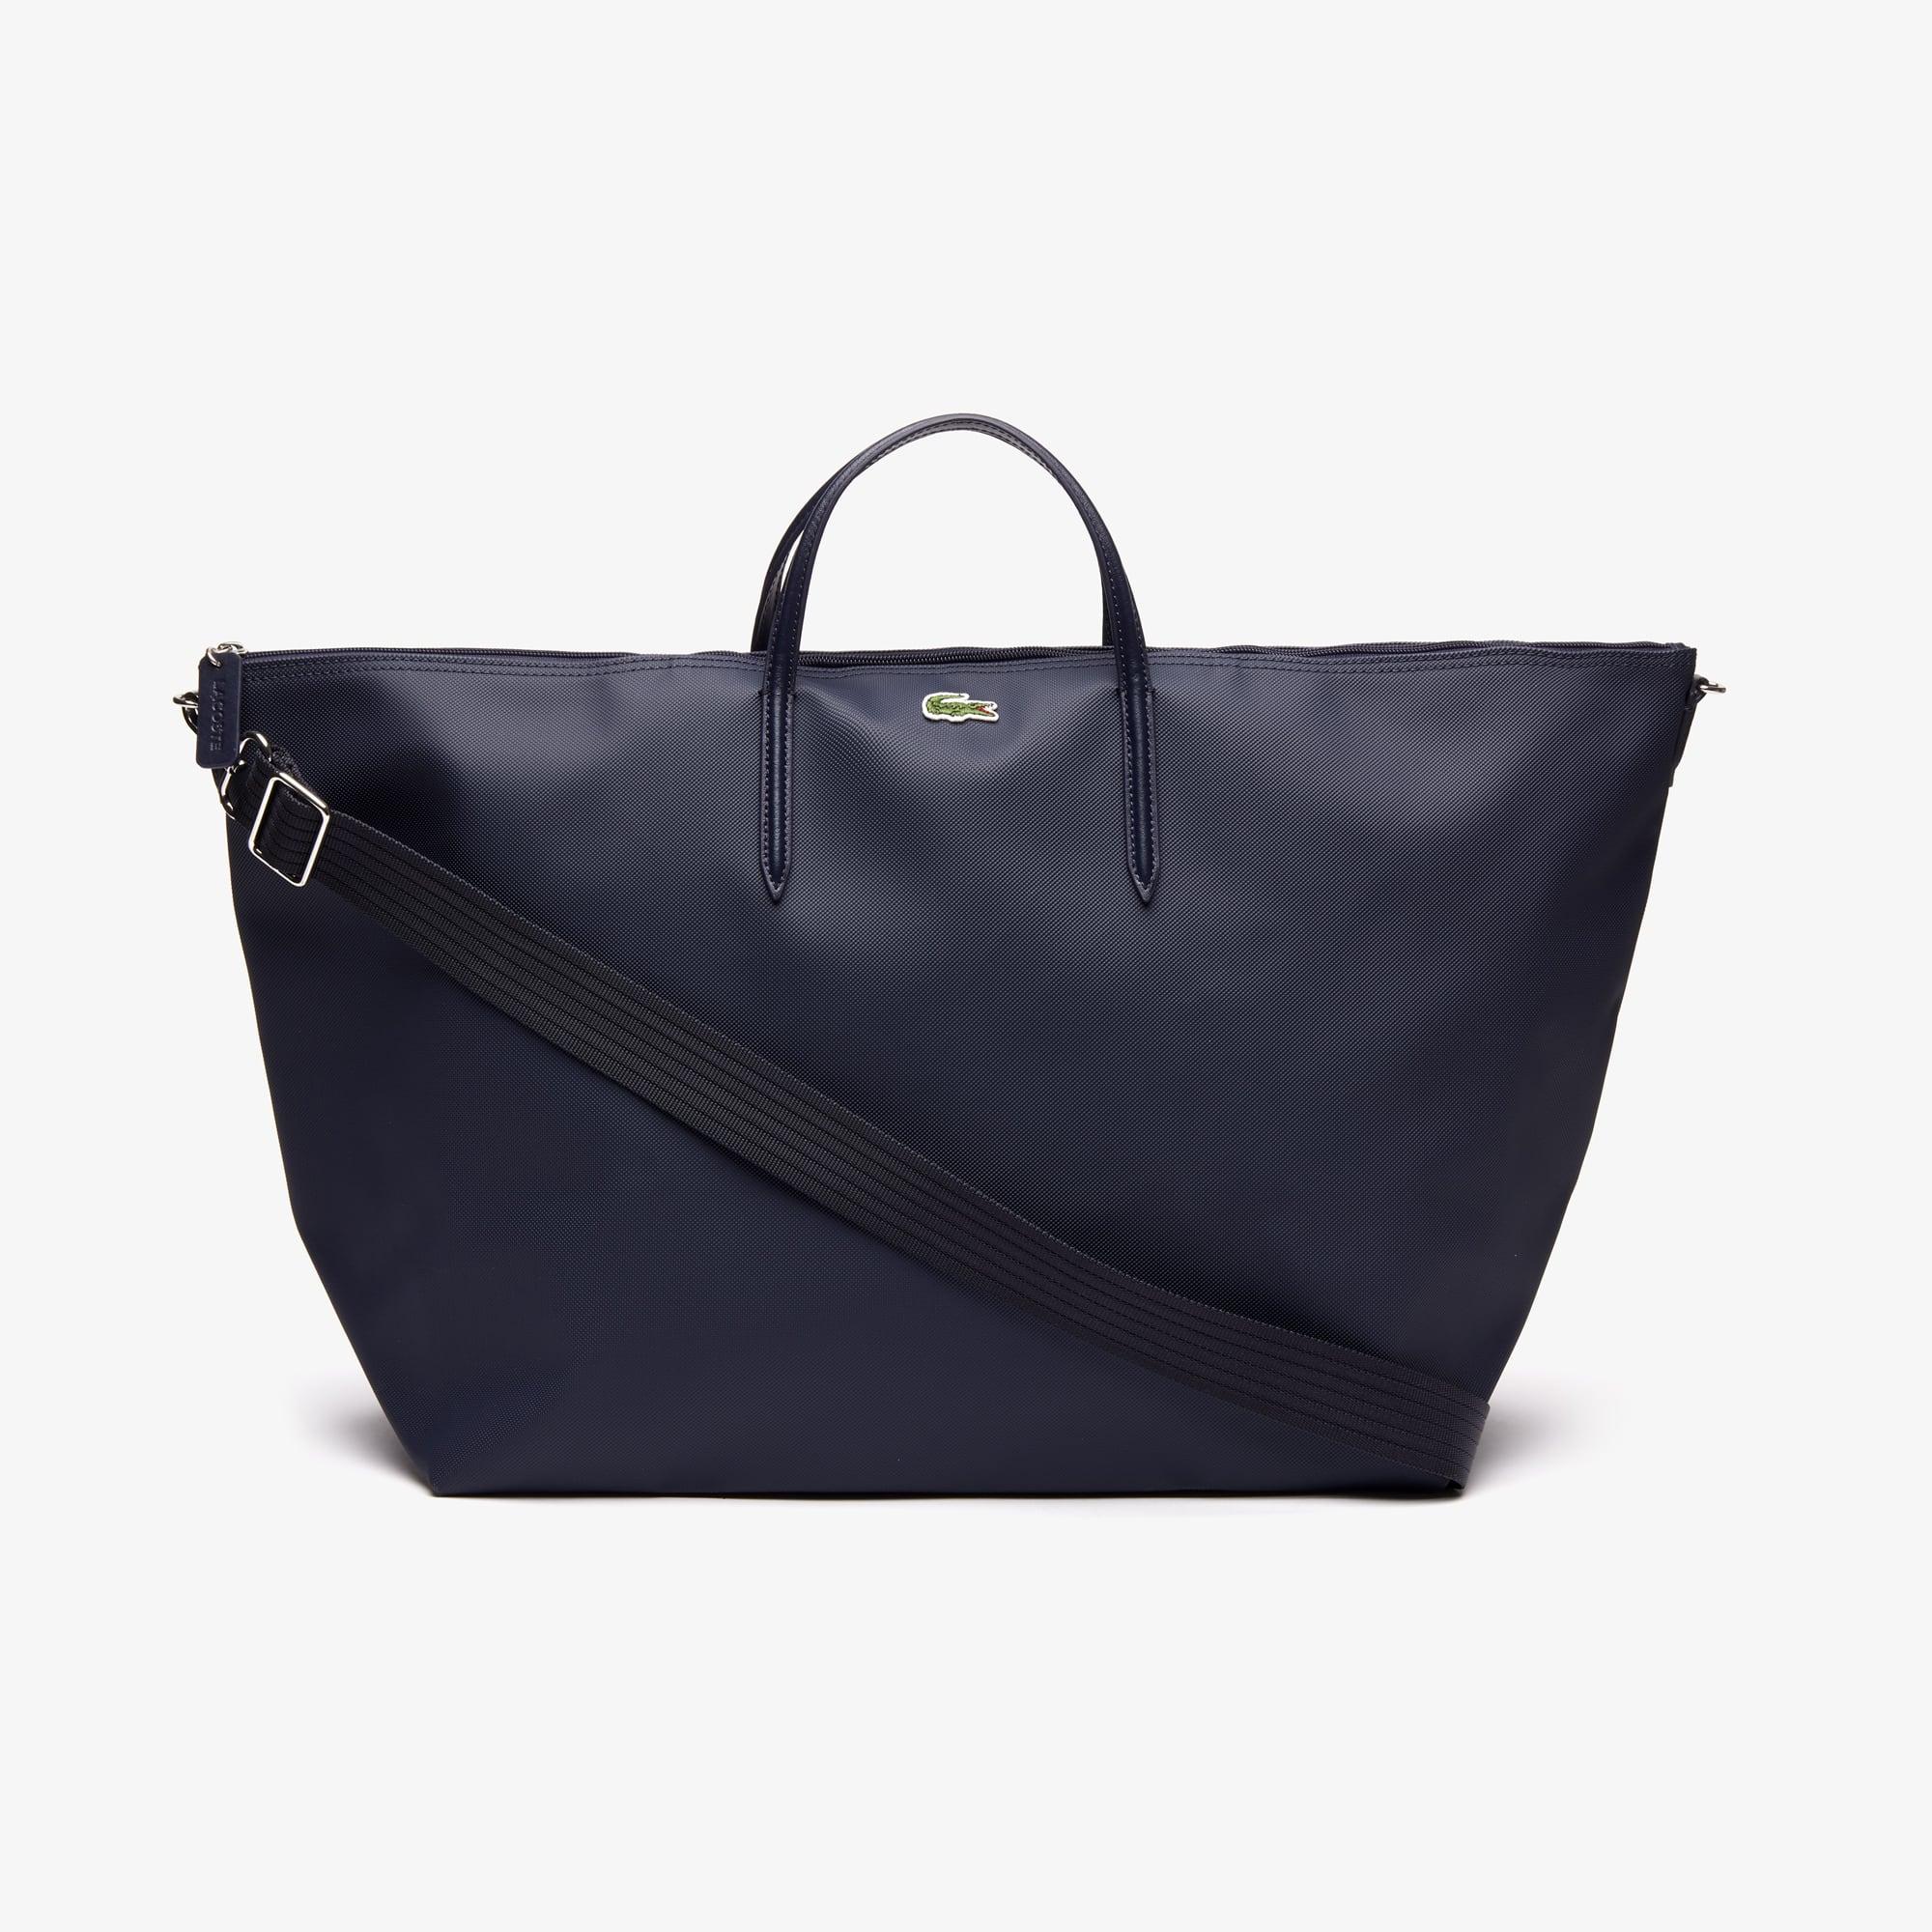 Personnalisez votre sac   LACOSTE 6402b203a07b